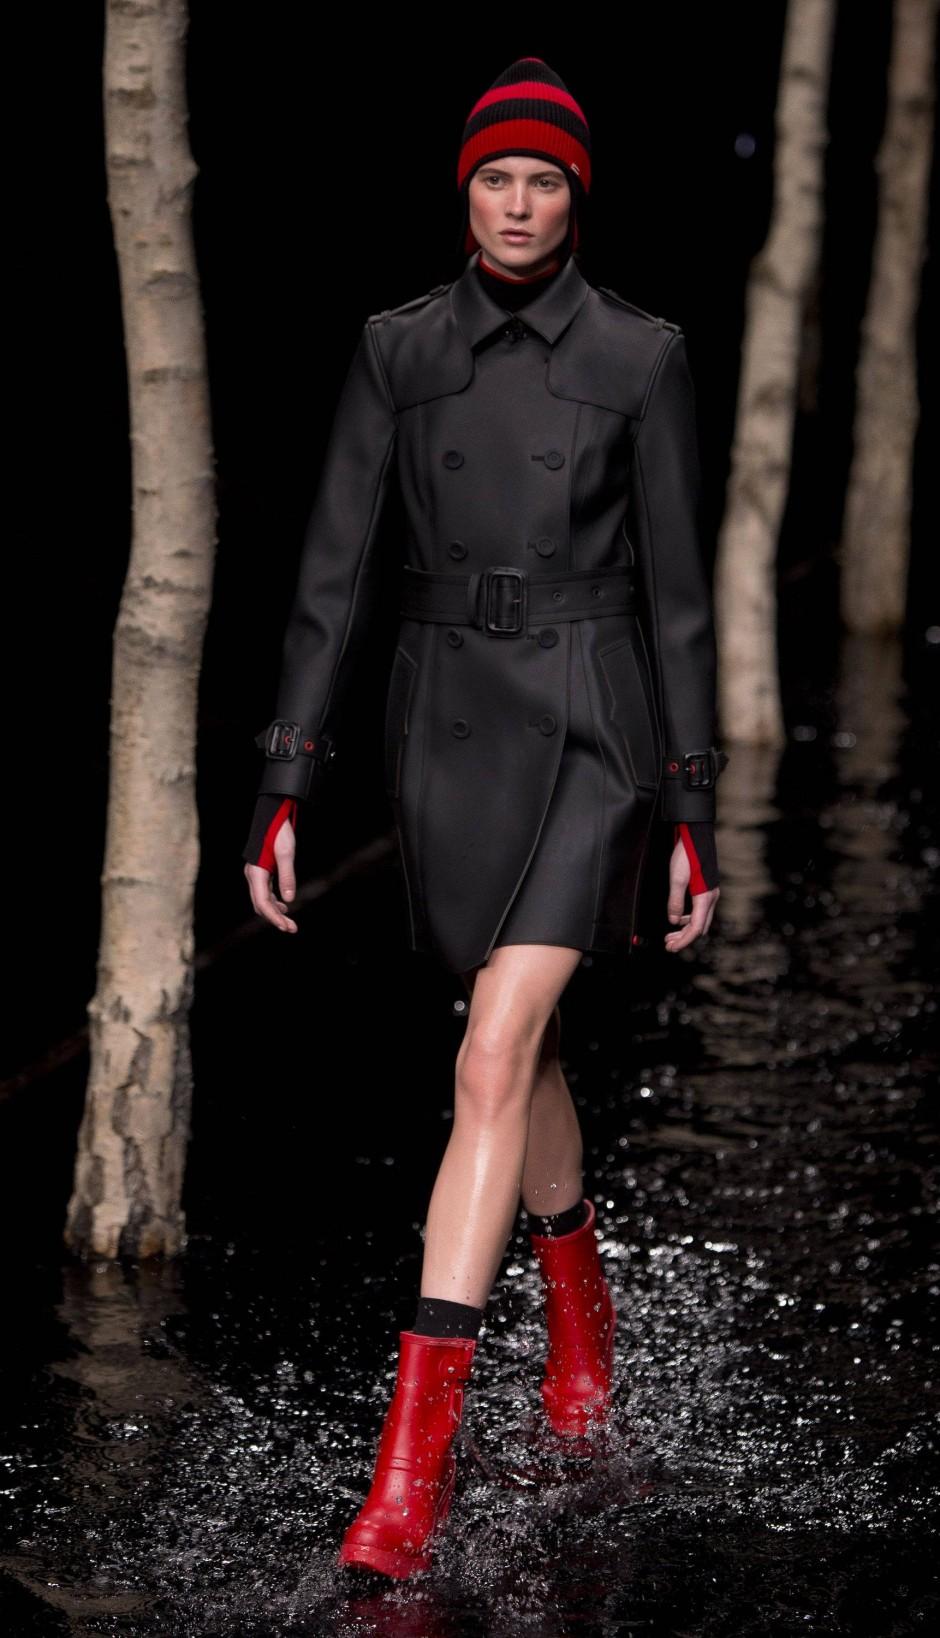 cheaper 575fb 9e31e Bilderstrecke zu: Modechef will Hunter zur Lifestyle-Marke ...